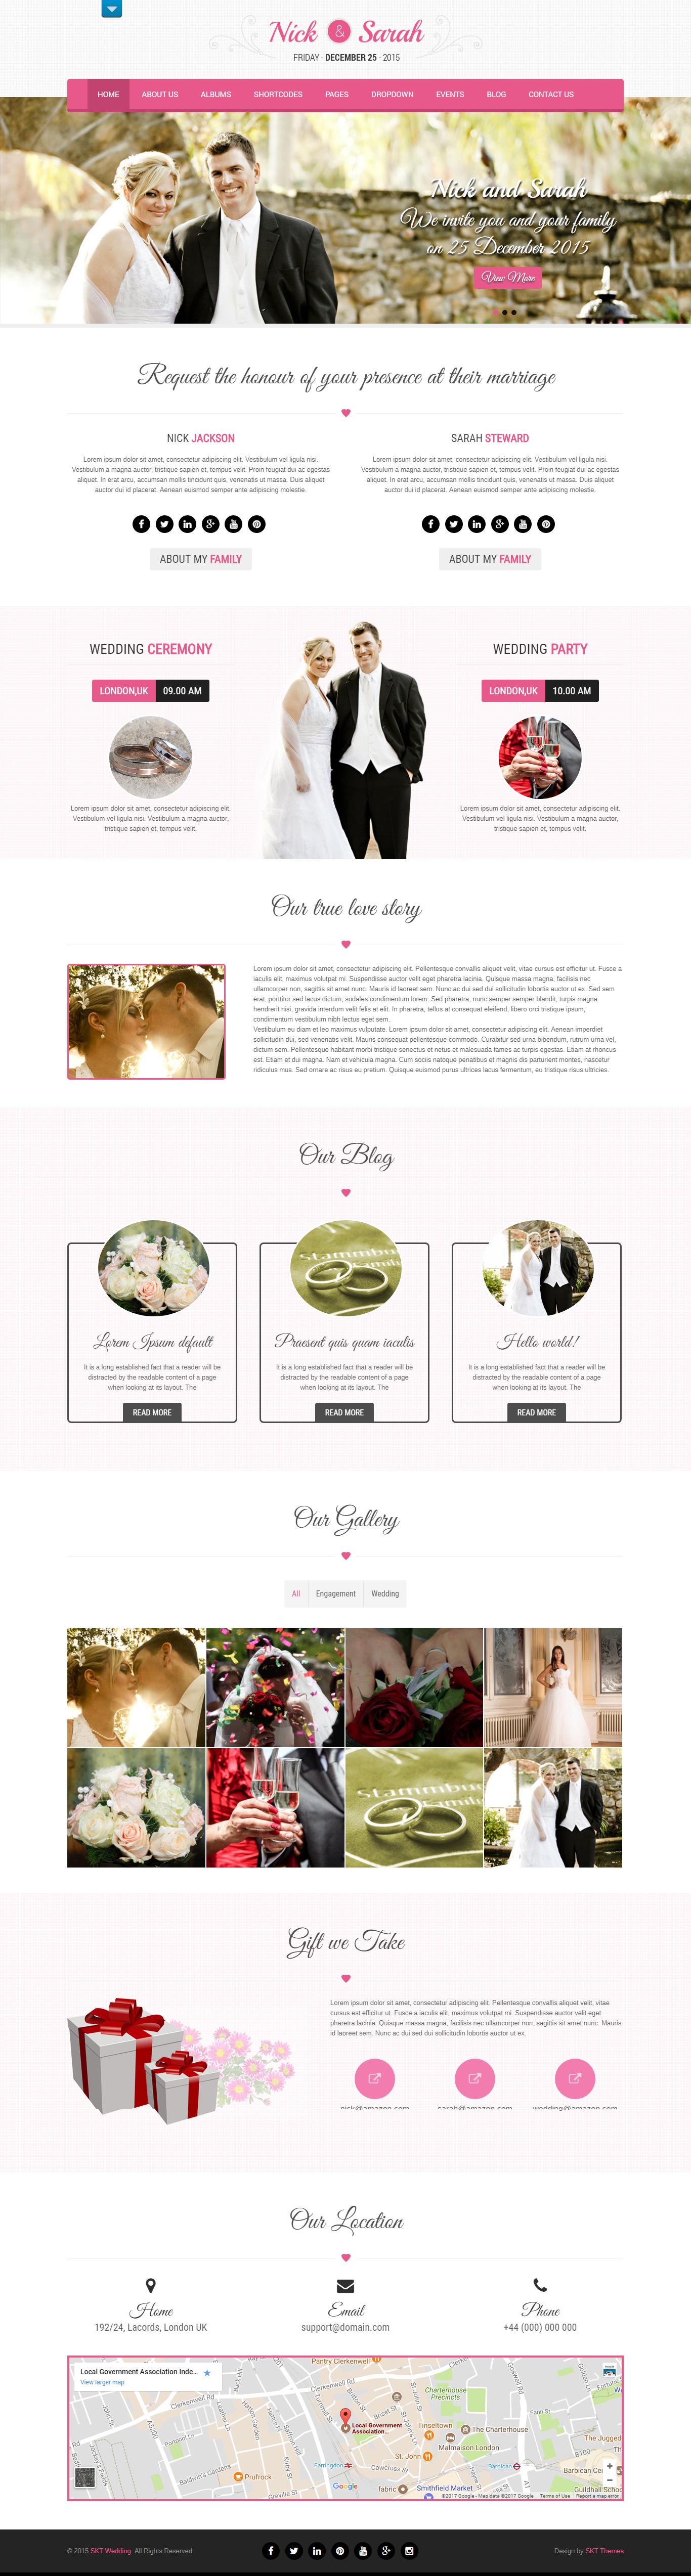 Free Wedding WordPress Themes for Engagement, Matrimonial Websites ...